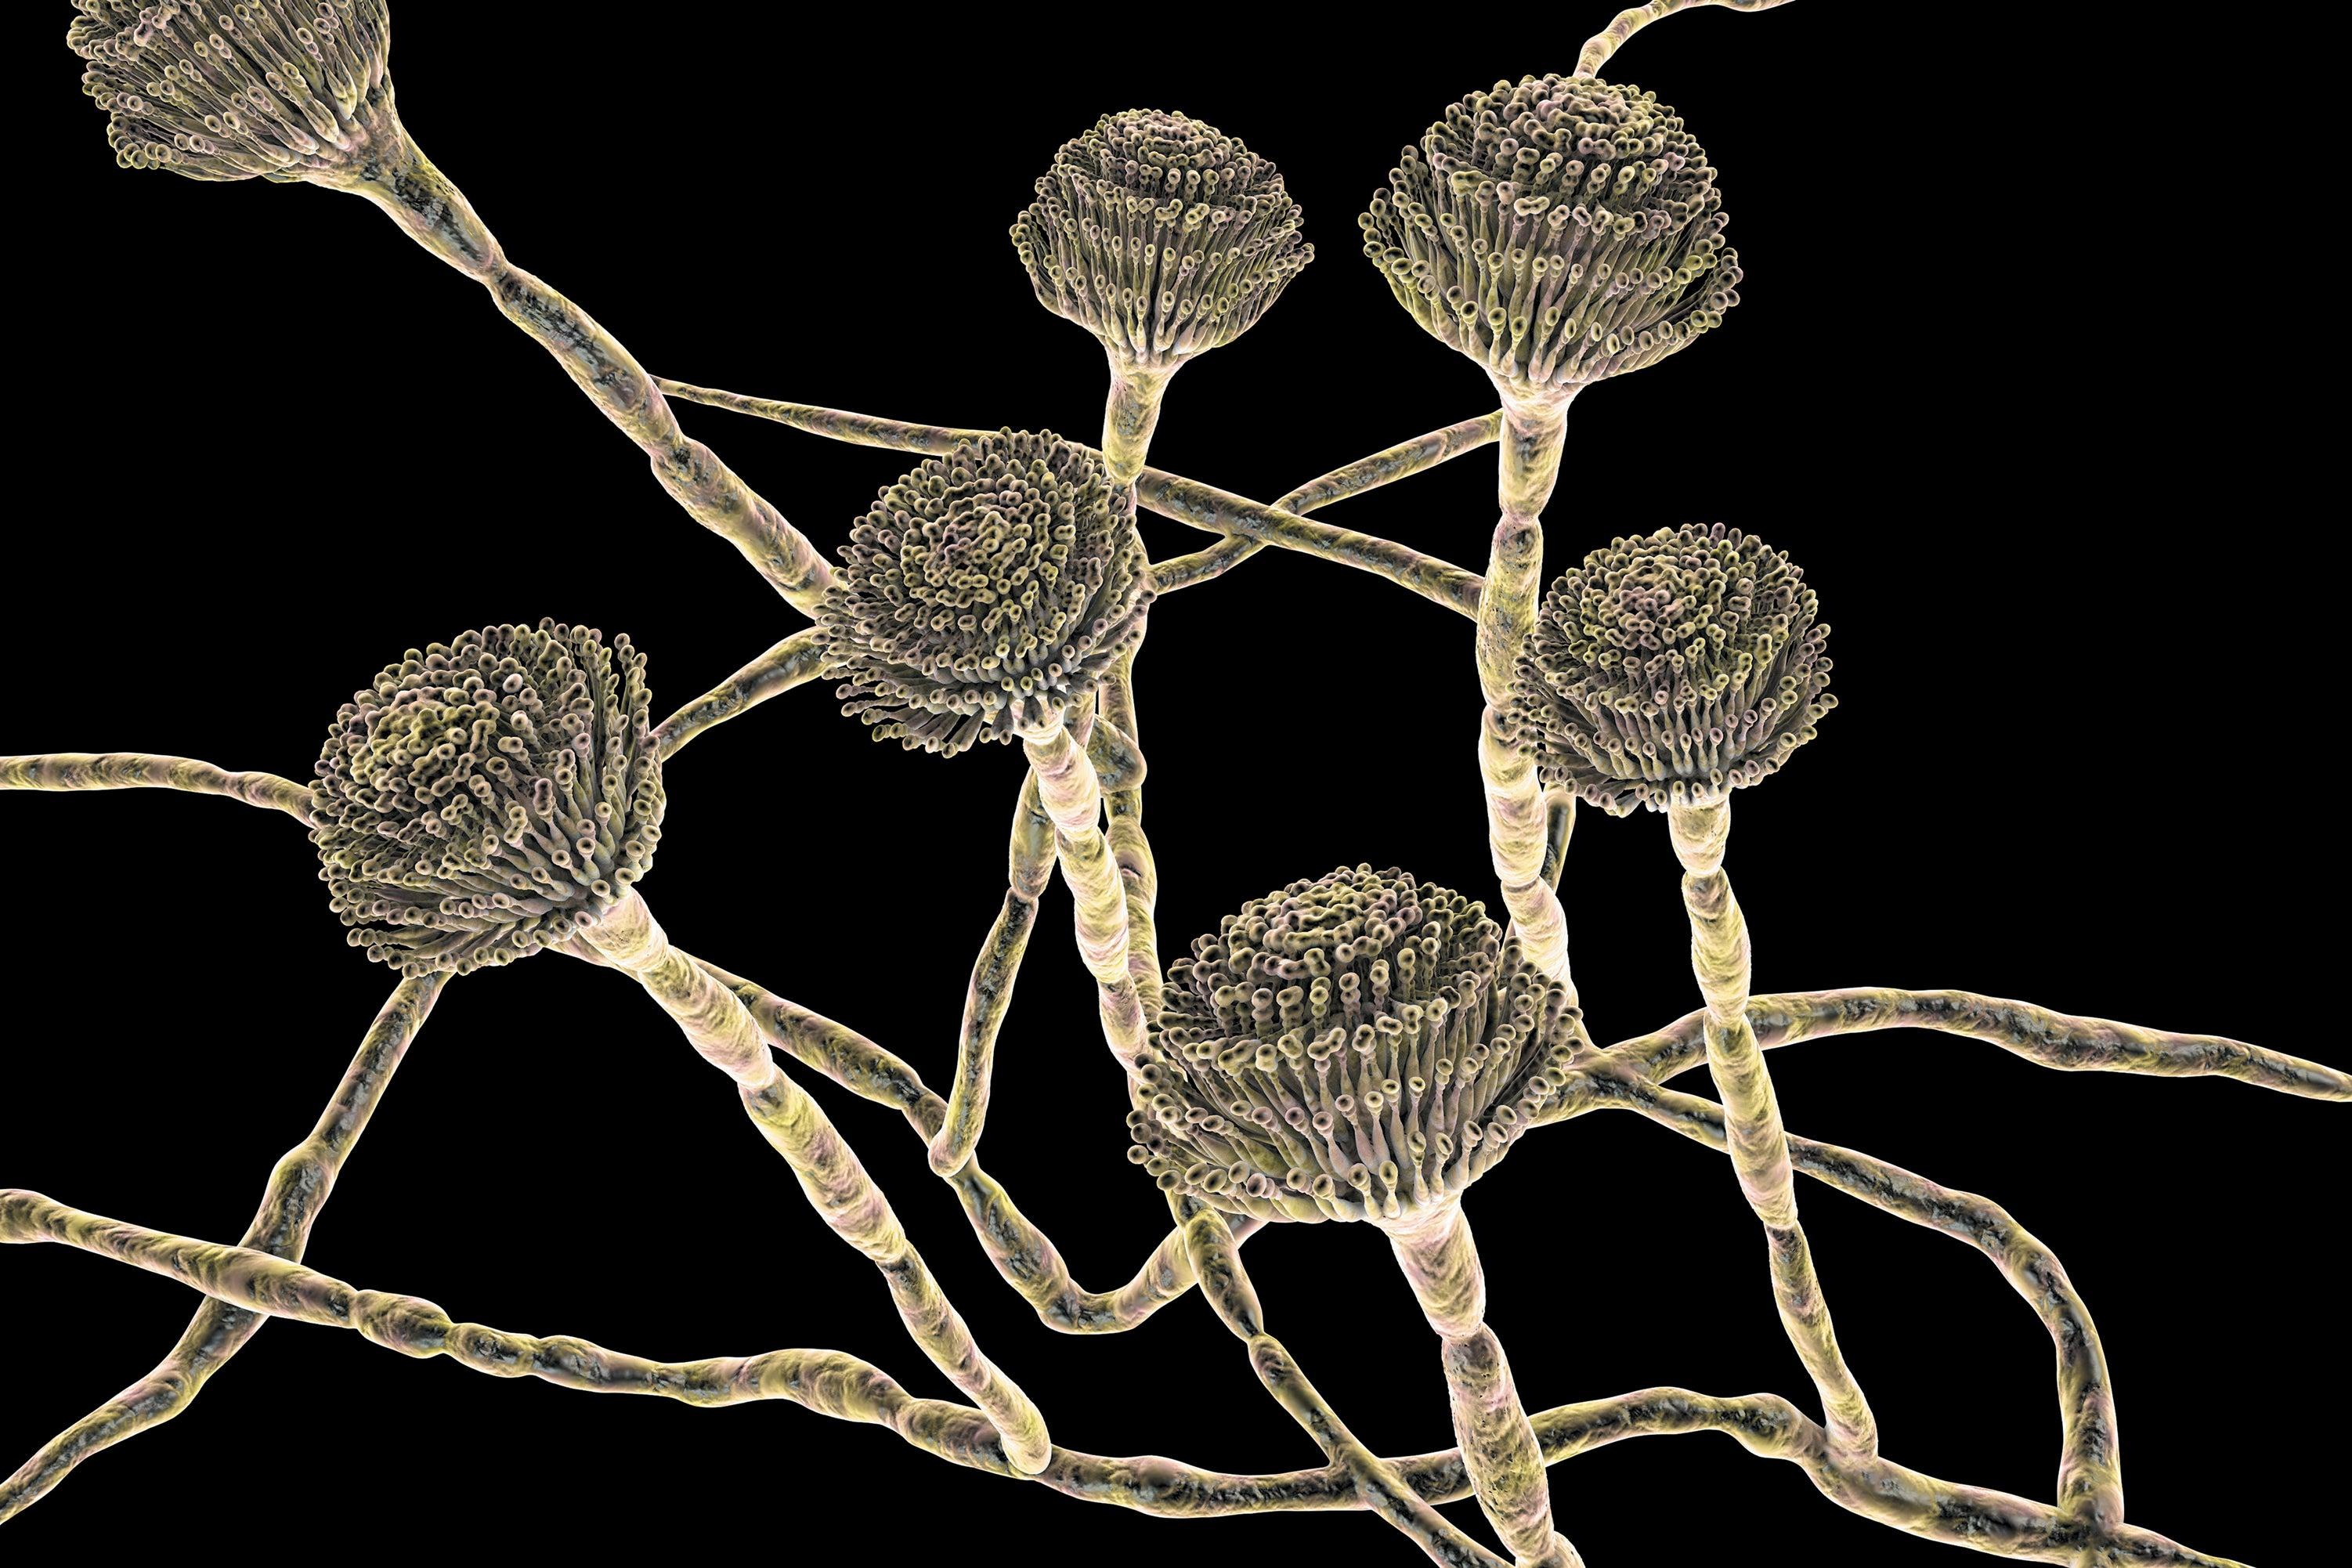 A closeup of Aspergillus fumigatus fungi